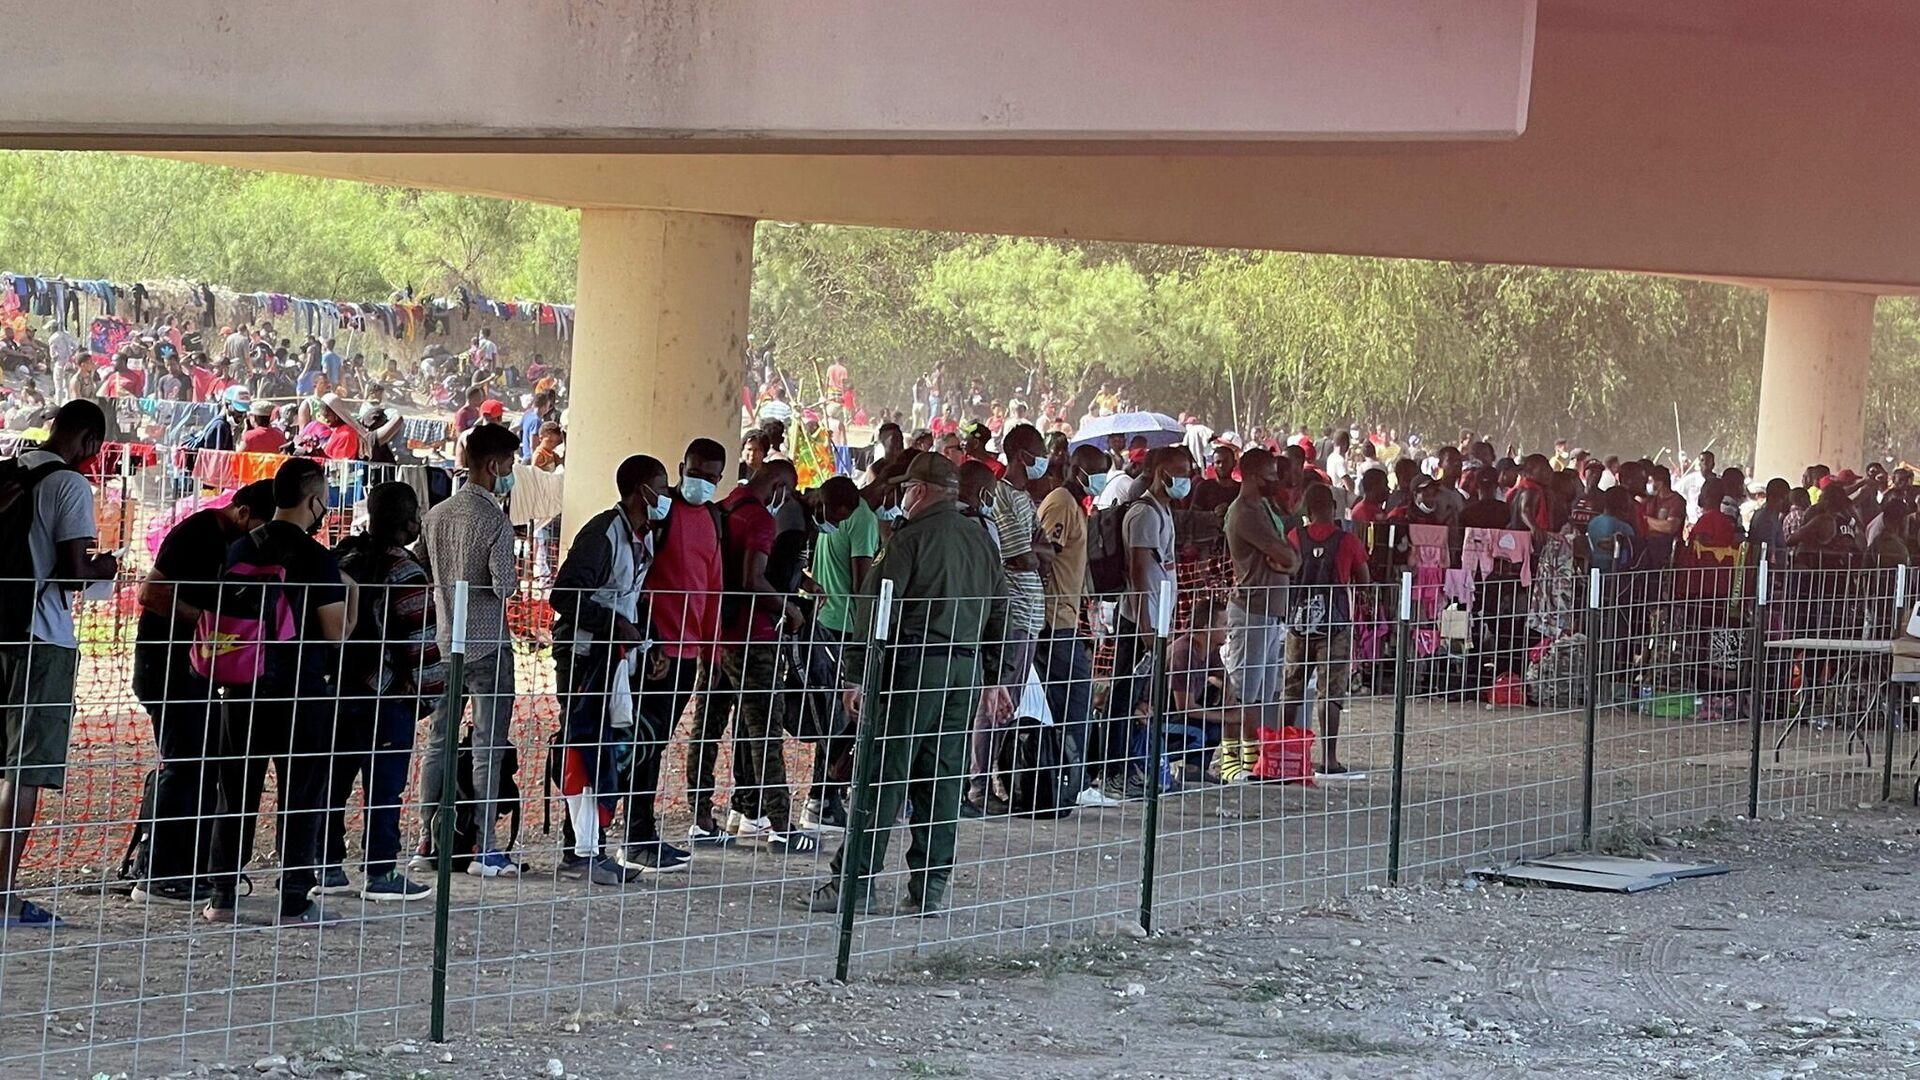 Asylsuchende in Del Rio, USA, der 16. September 2021 - SNA, 1920, 18.09.2021